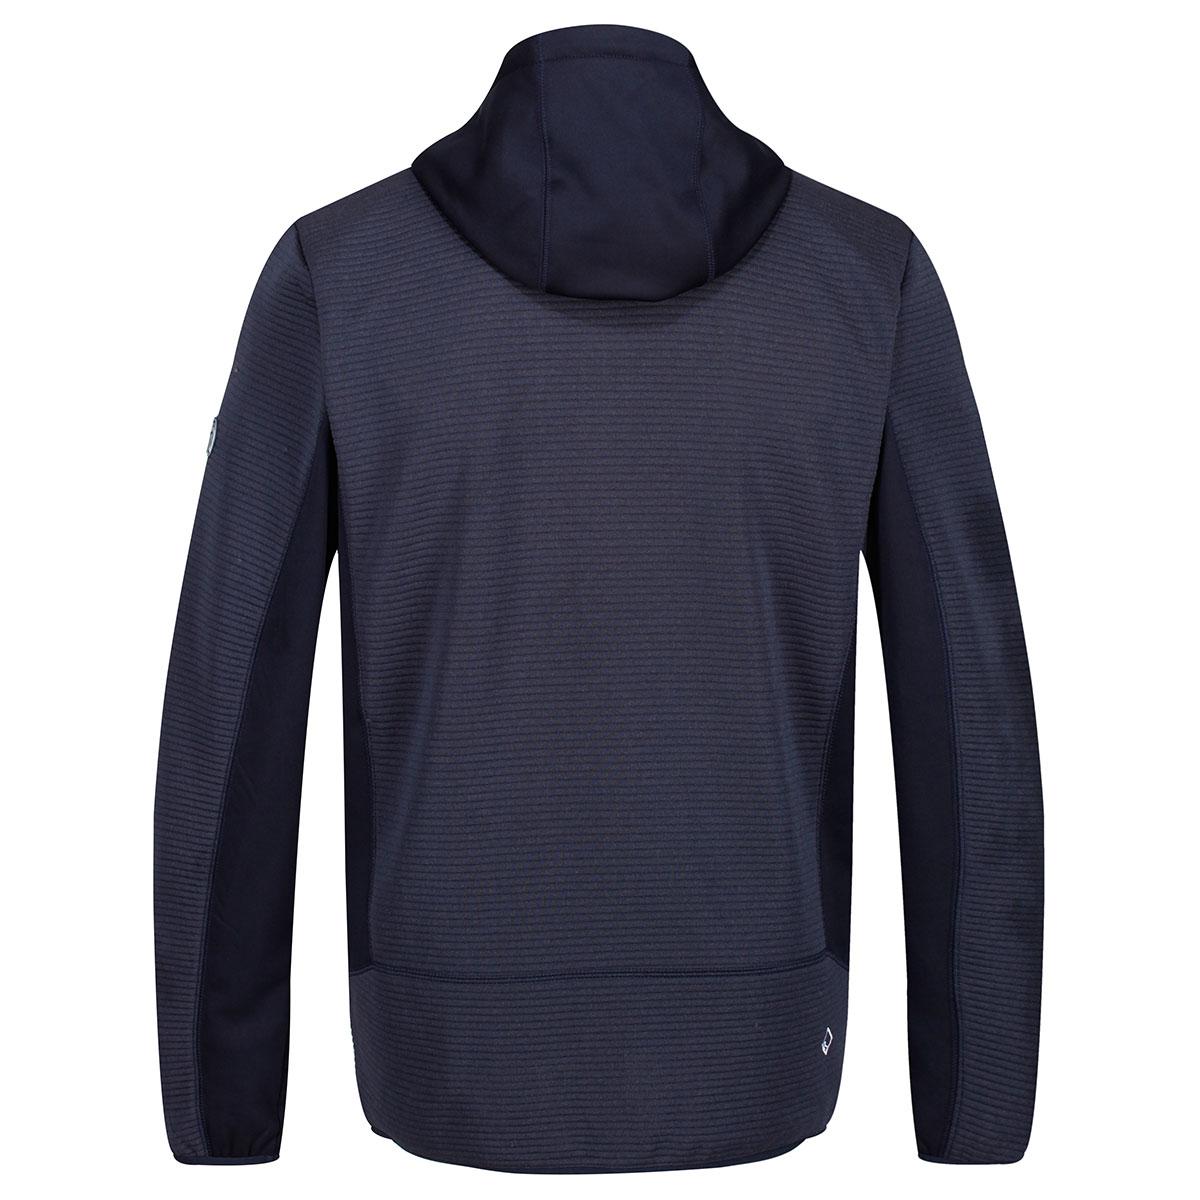 Regatta-Mens-Tarnis-II-Ribbed-Fabric-Stretch-Hoody-Jacket-70-OFF-RRP thumbnail 9